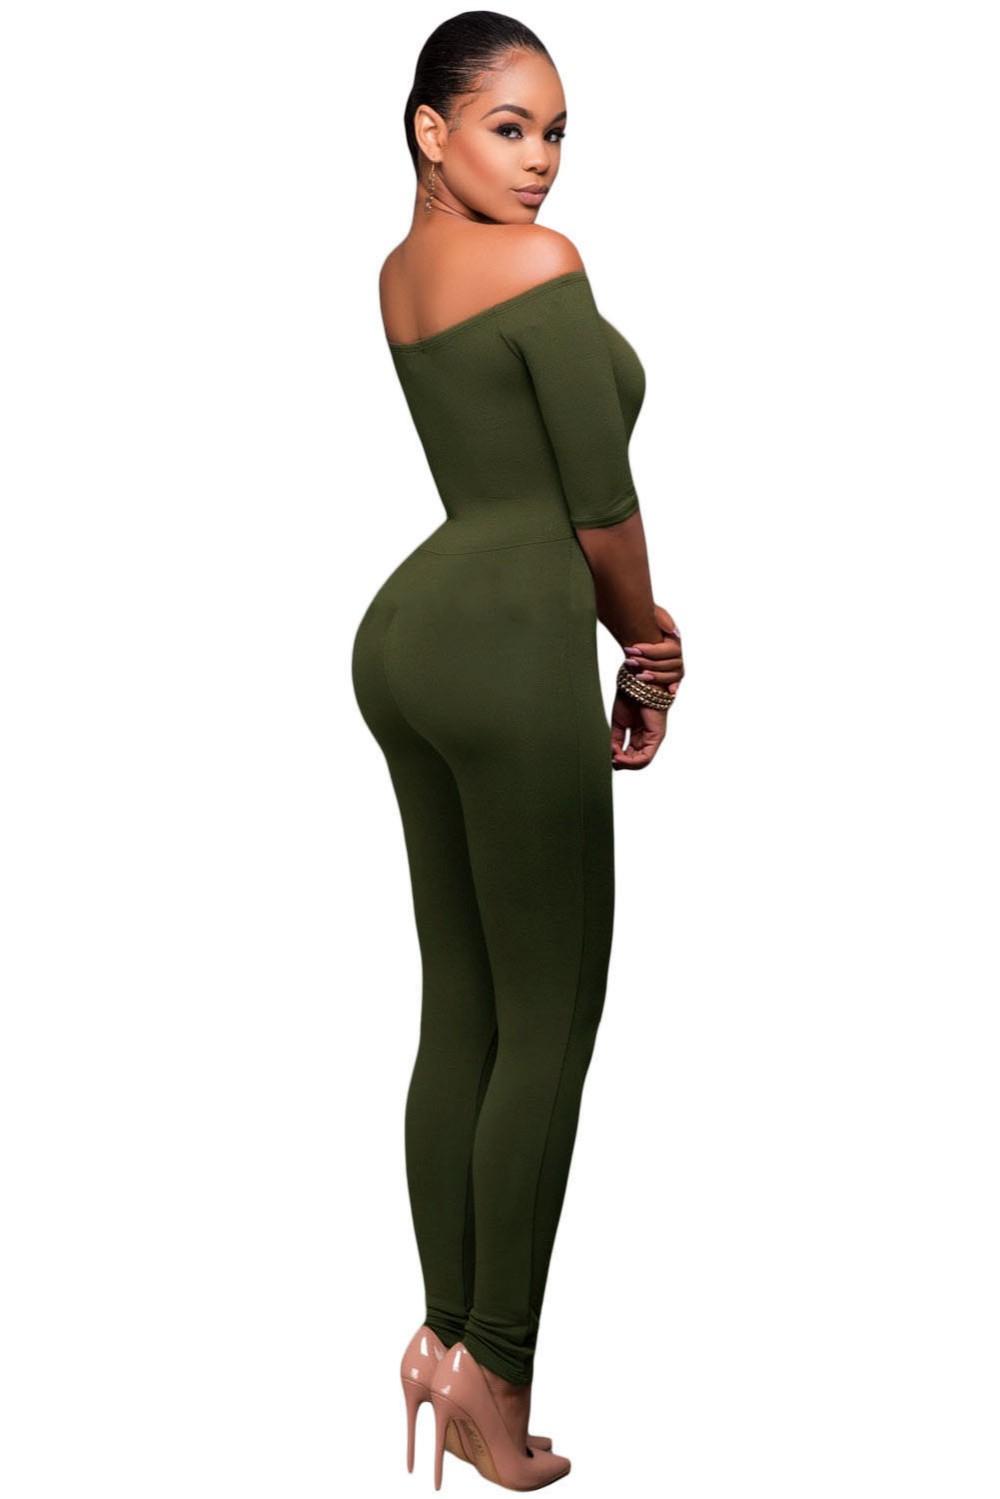 Olive-Green-Bardot-Neckline-Fashion-Jumpsuit-LC64193-9-3